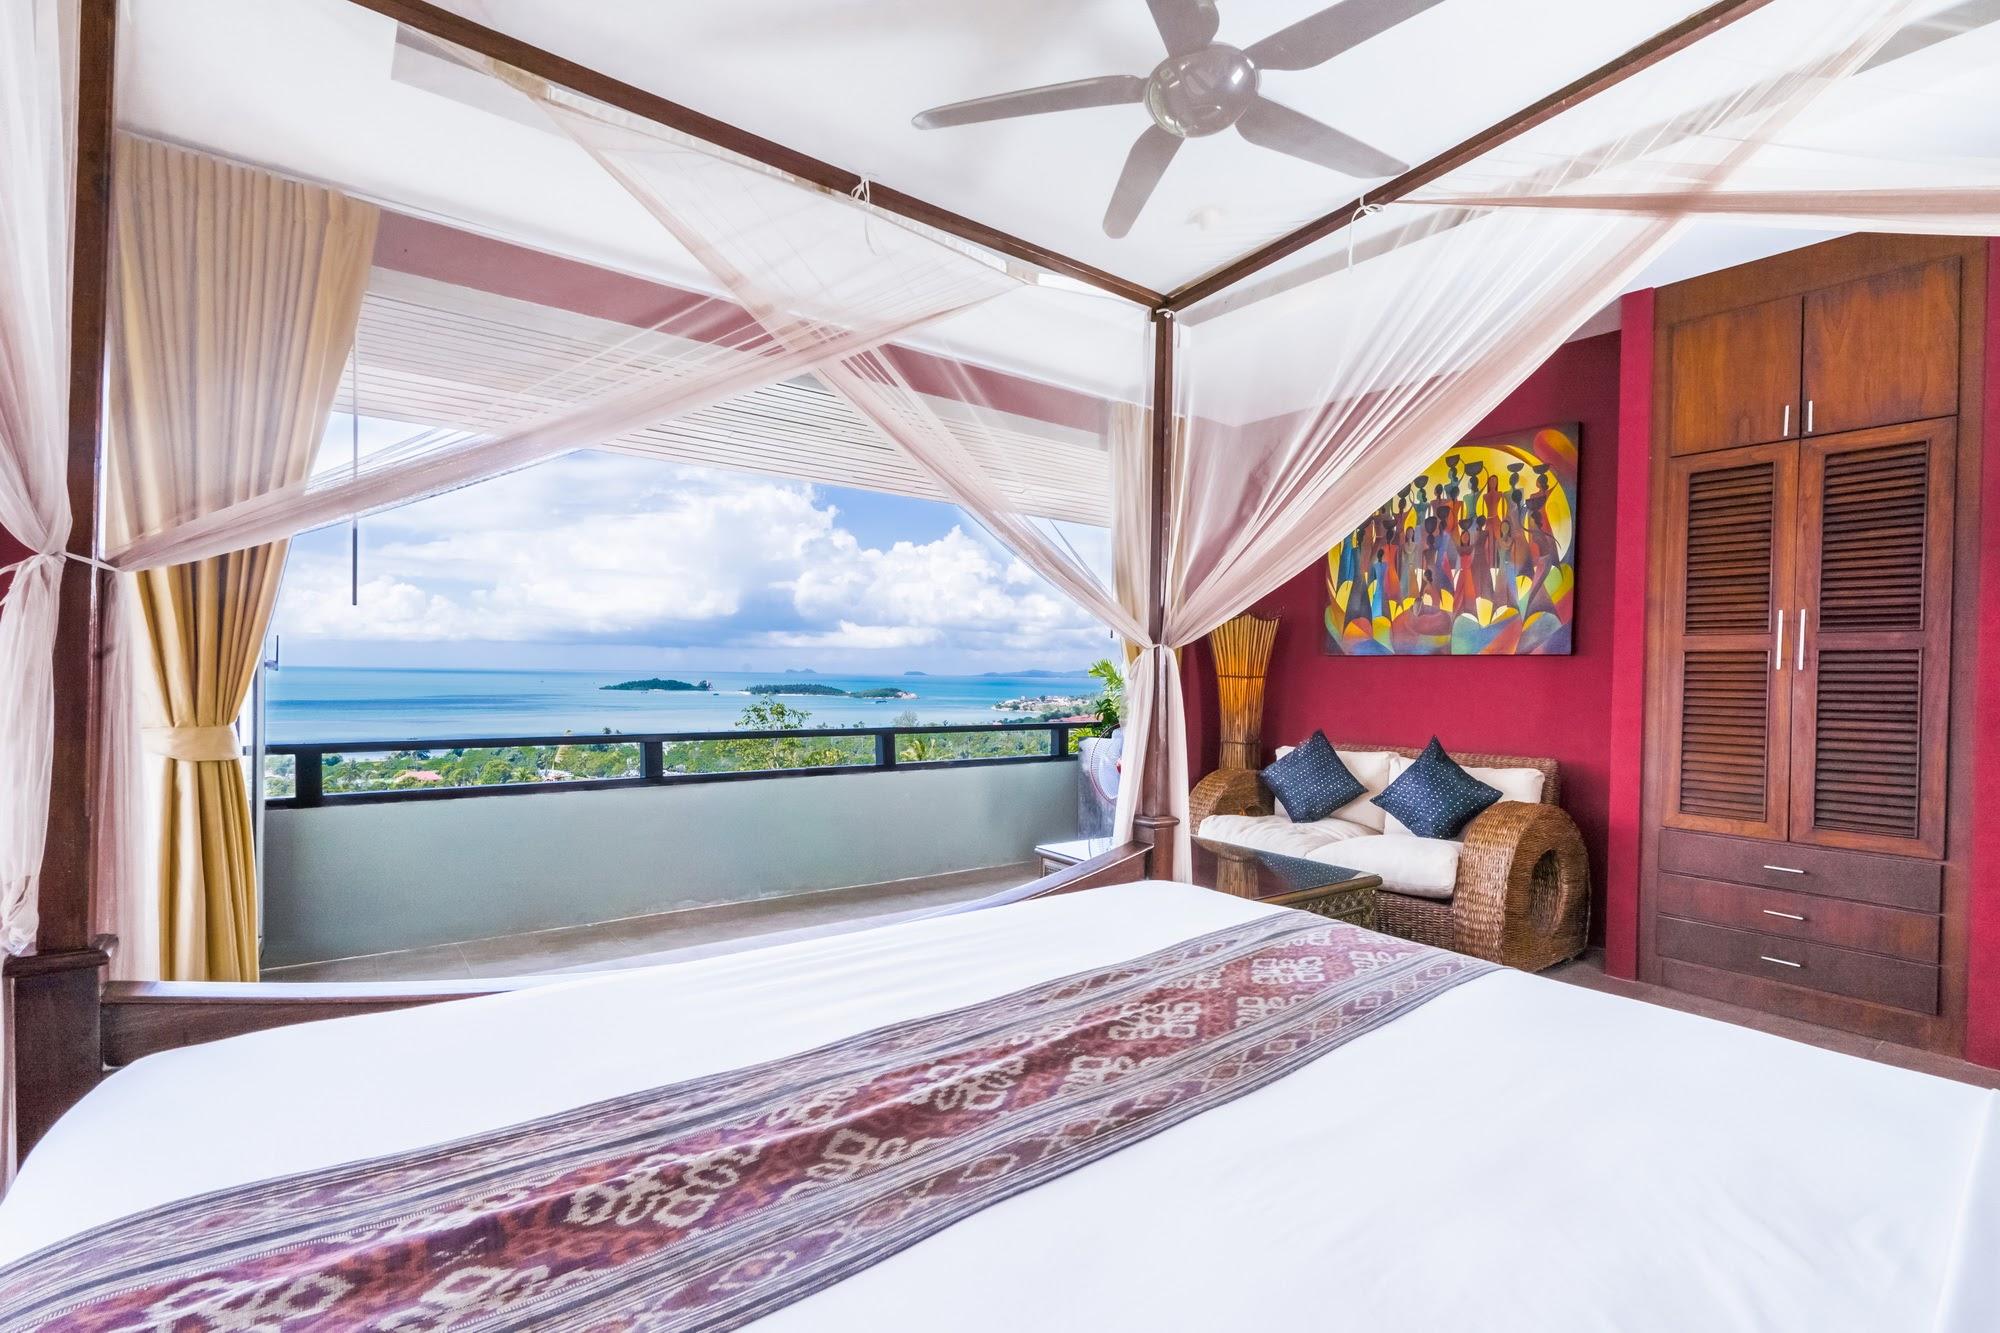 Koh+Samui+Vacation+Villa+Pool+Sea+View+(10).jpg